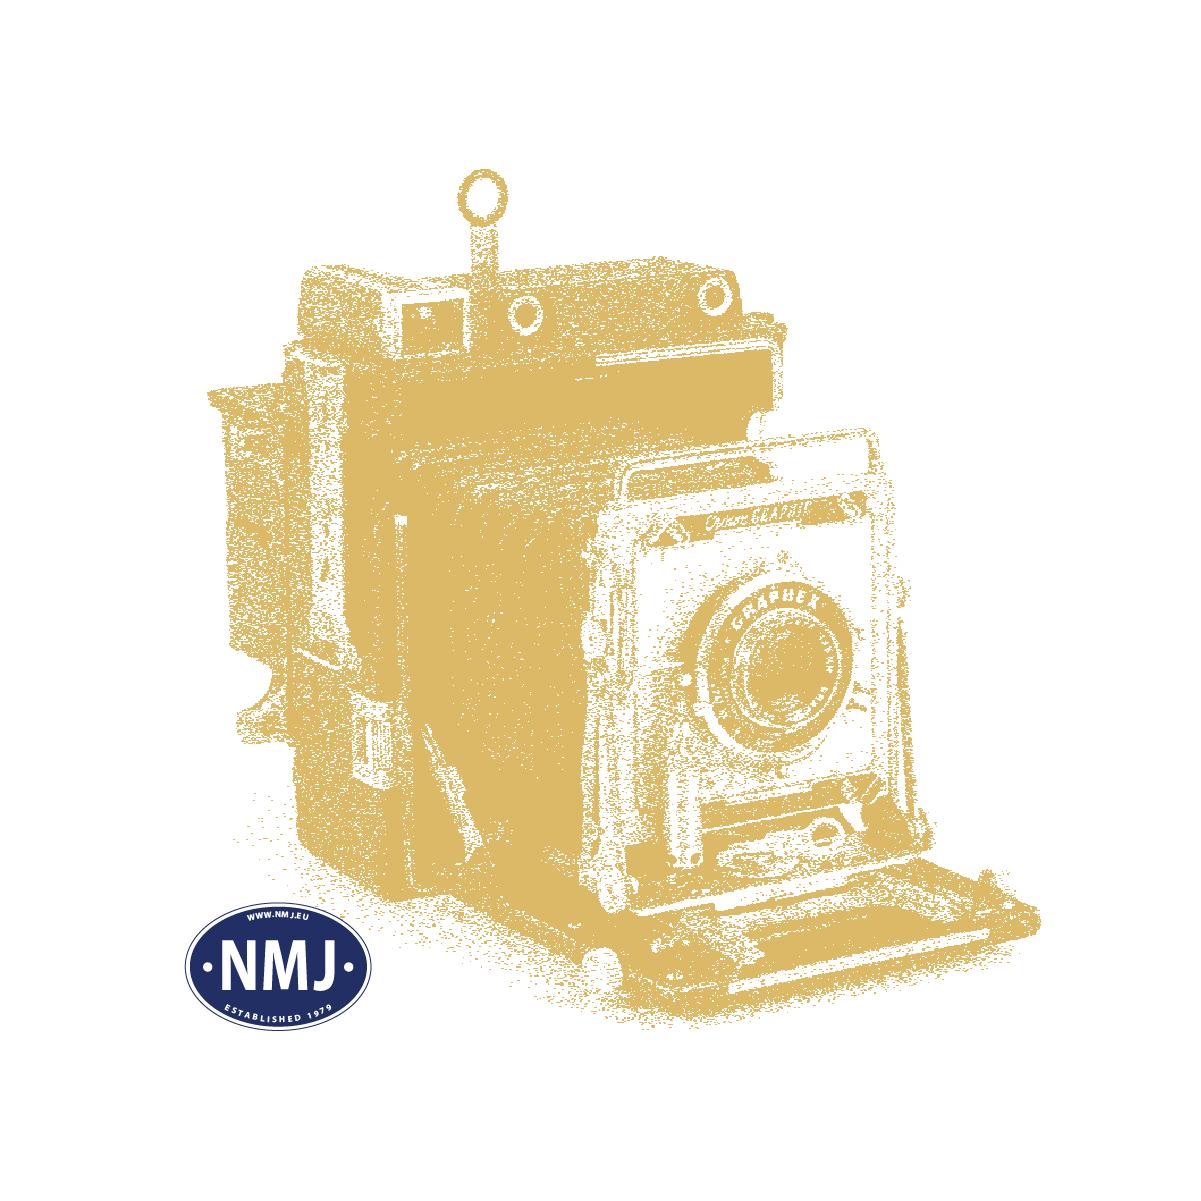 NMJT80.102AC - NMJ Topline NSB EL17.2222, AC